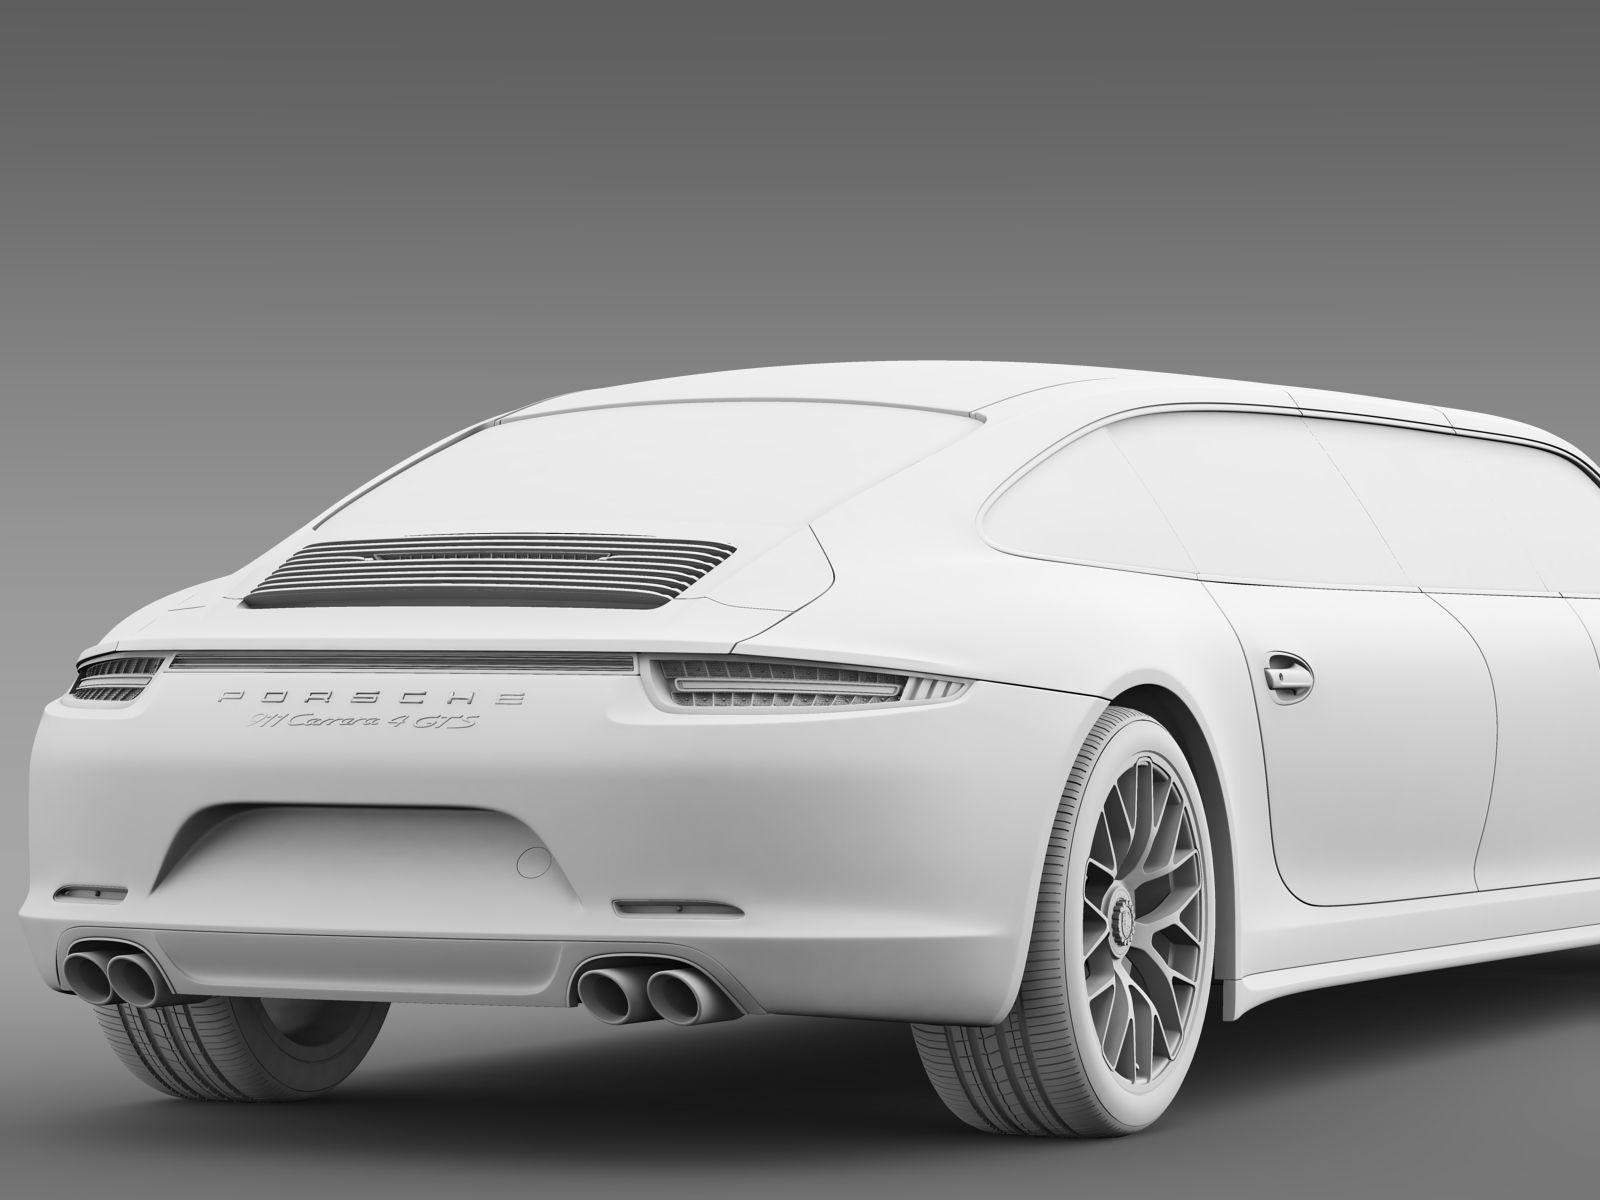 porsche 911 carrera 4 gts limousine 2016 3d model max obj 3ds fbx c4d lwo lw lws. Black Bedroom Furniture Sets. Home Design Ideas